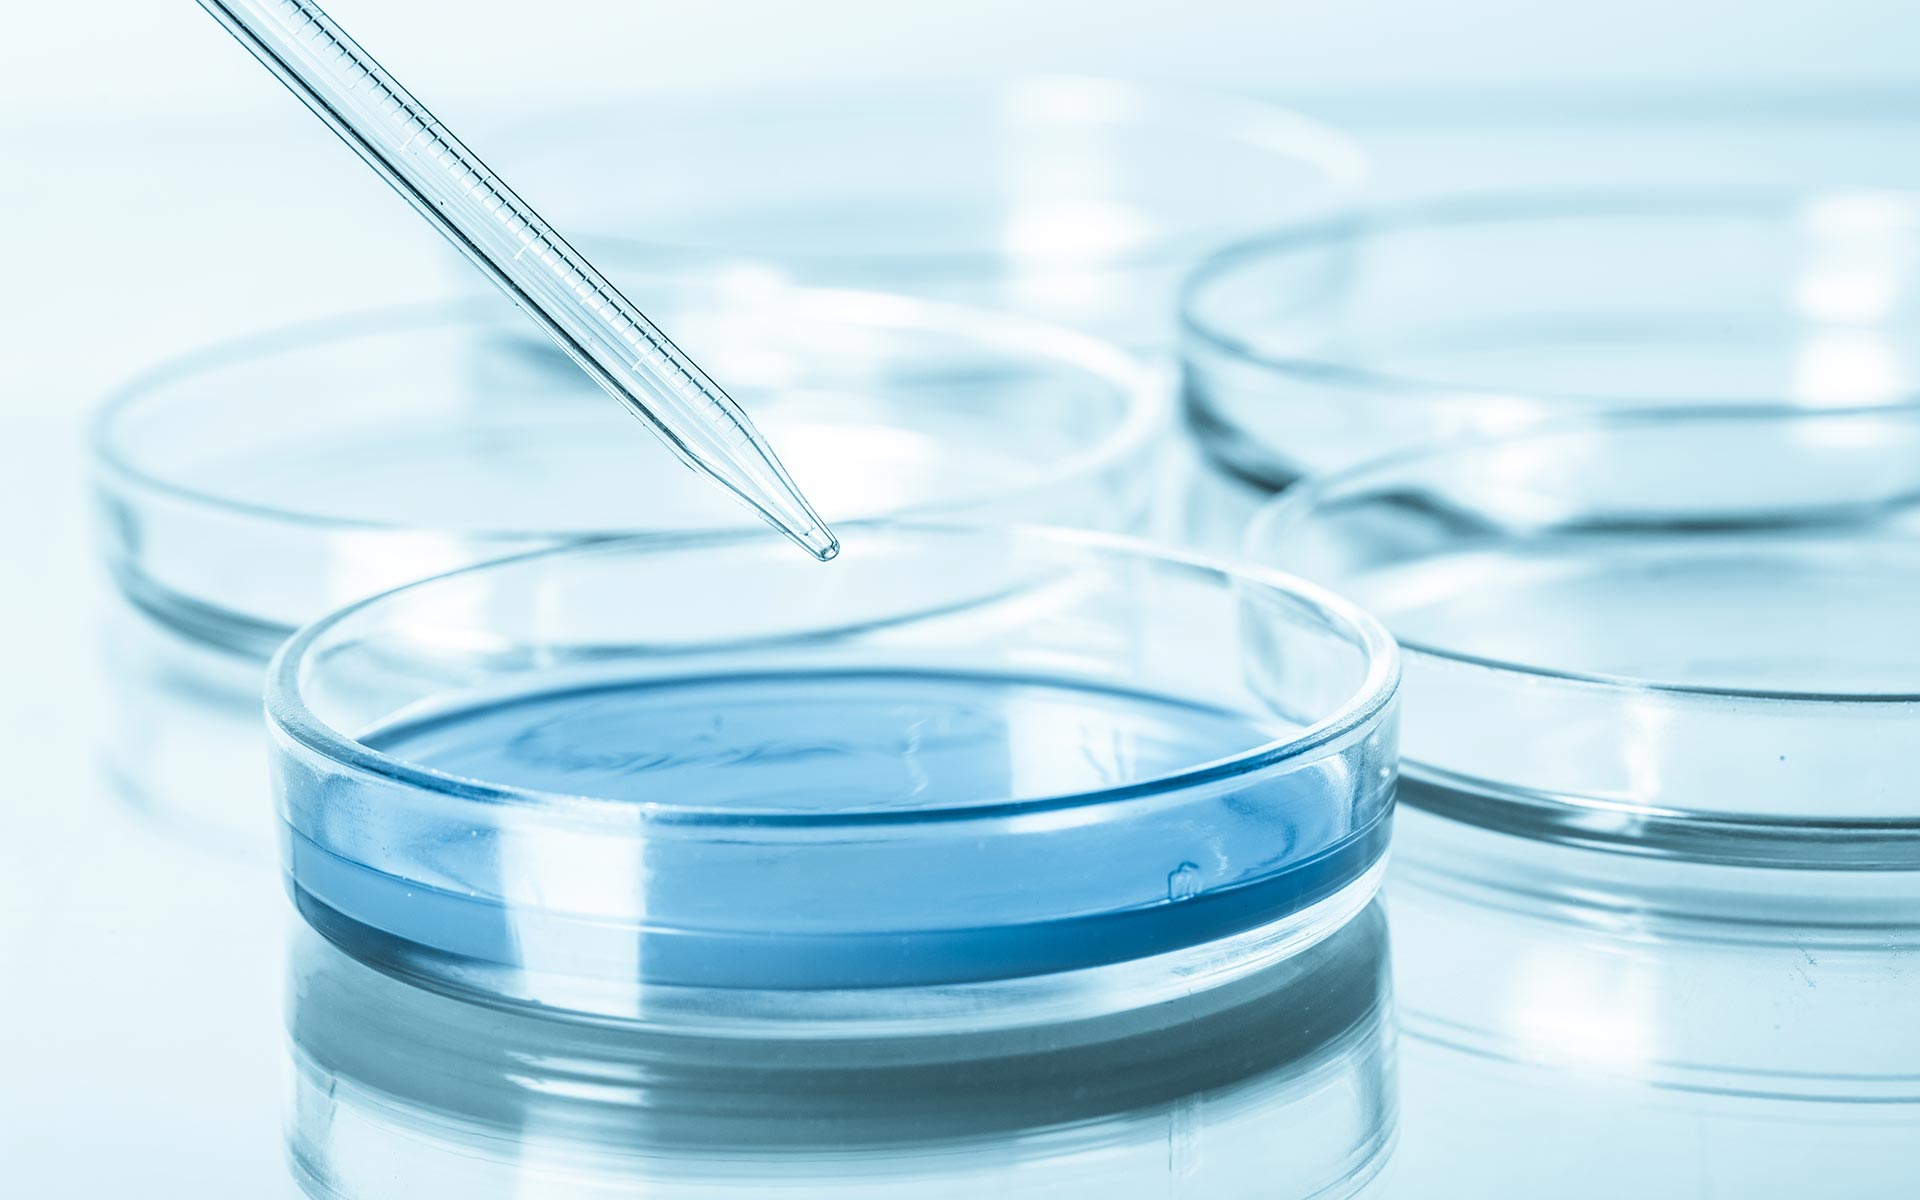 insibio-stan-cultivo-celular